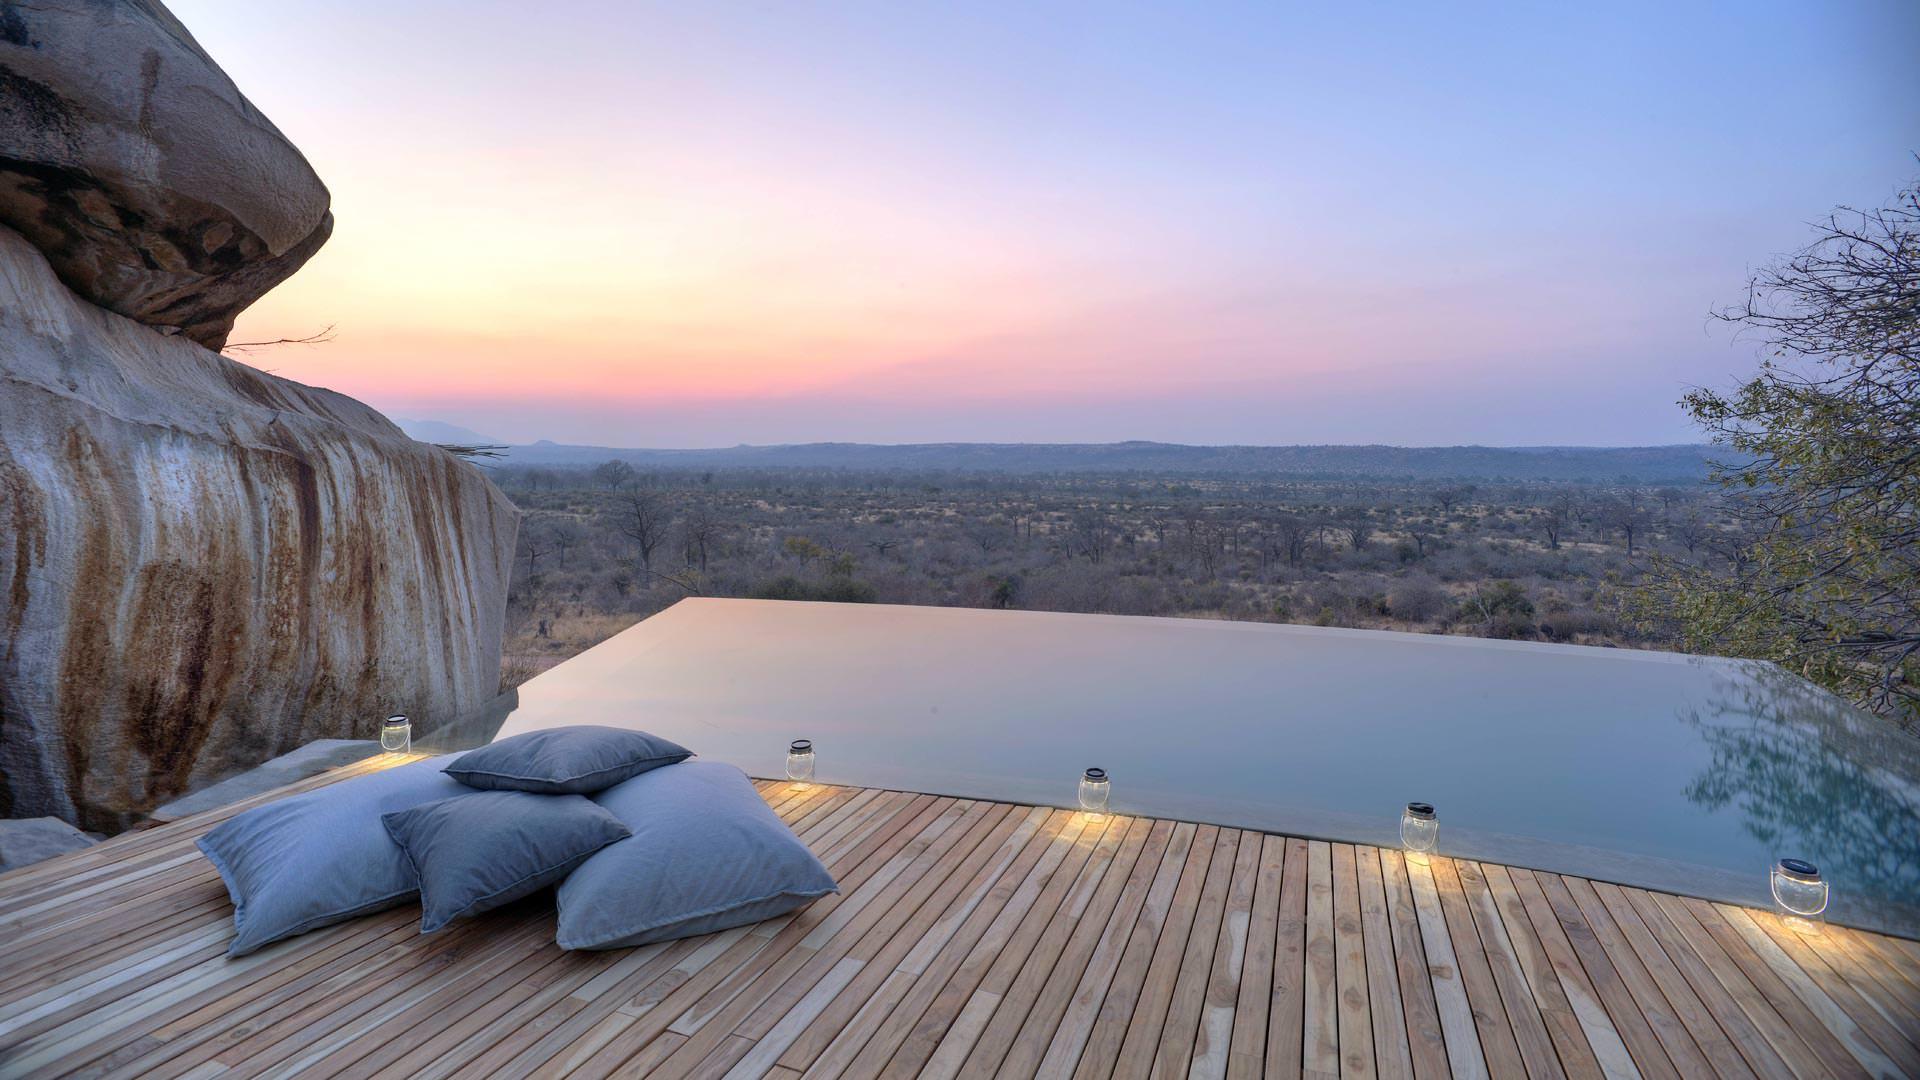 The pool at Jabali Ridge